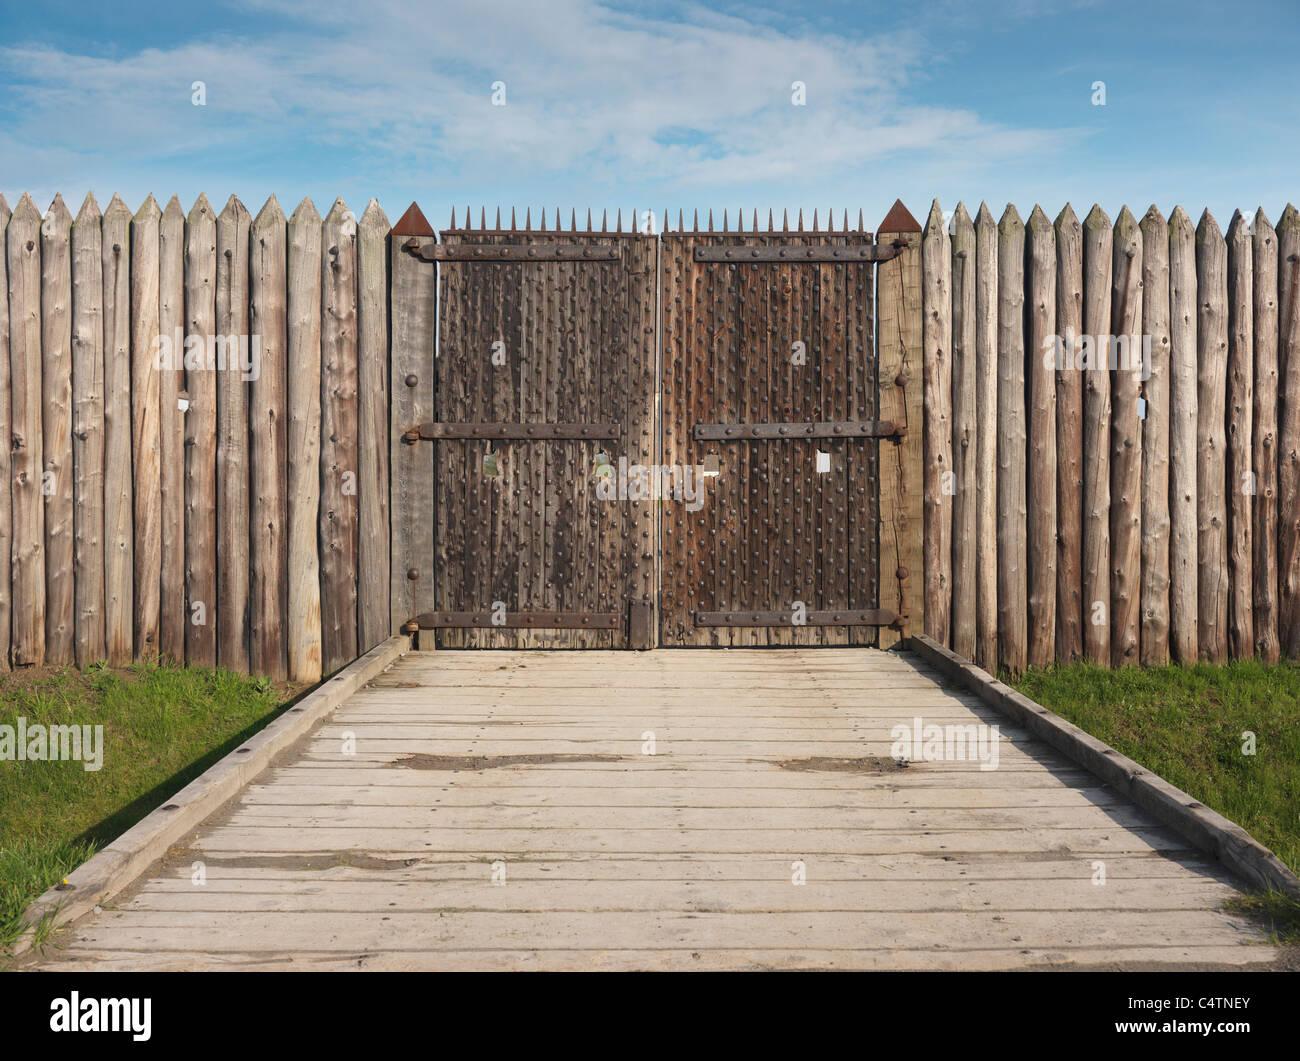 Portes de Fort George, Lieu historique national à Niagara-on-the-Lake, Ontario, Canada. Banque D'Images